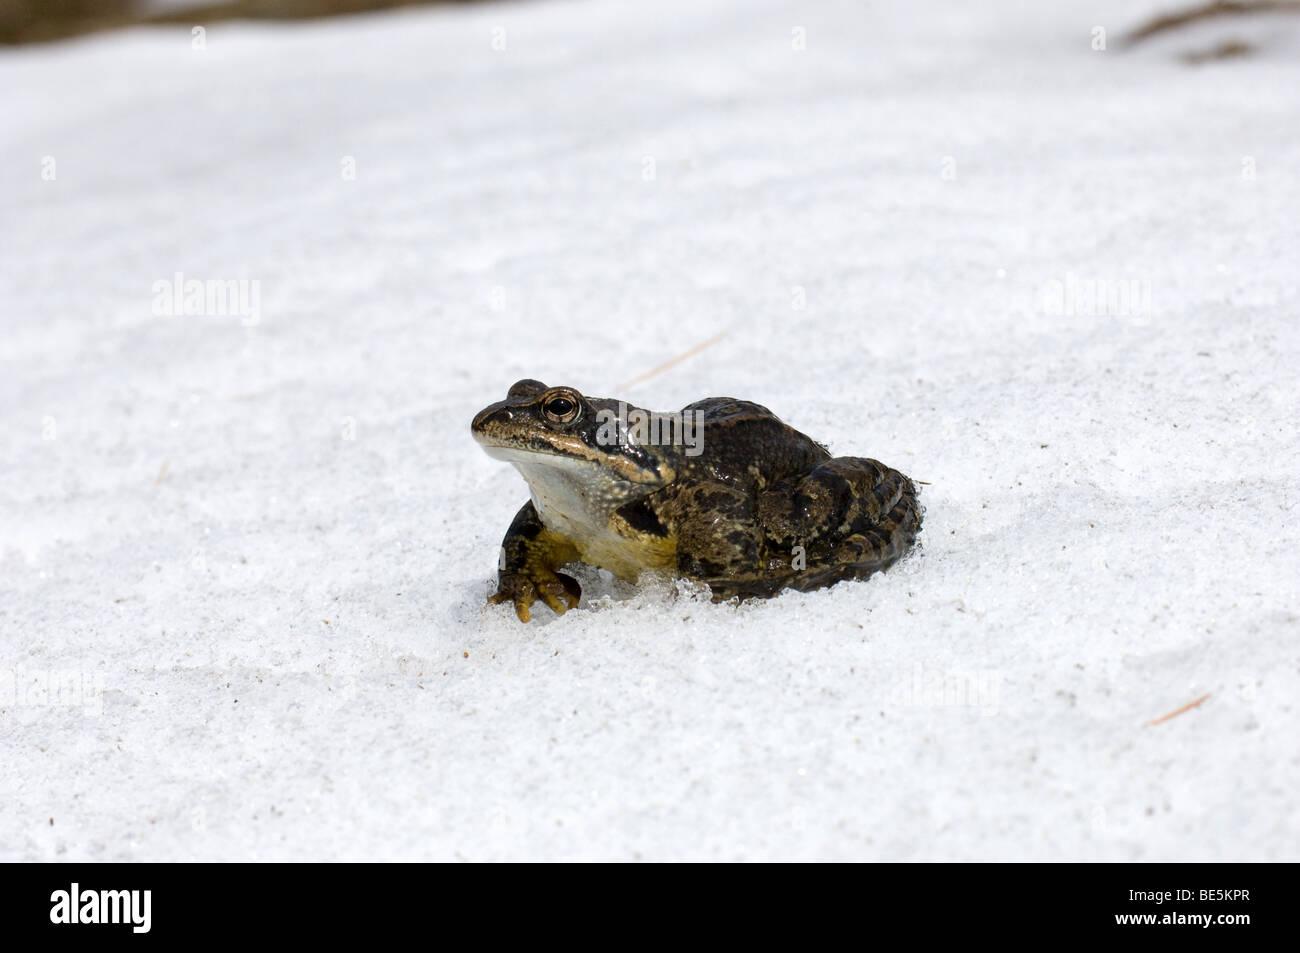 Rana temporaria anfibi anuri sangue freddo cold blood neve freddo inverno frog snow cold winter  Engadina Val Roseg - Stock Image